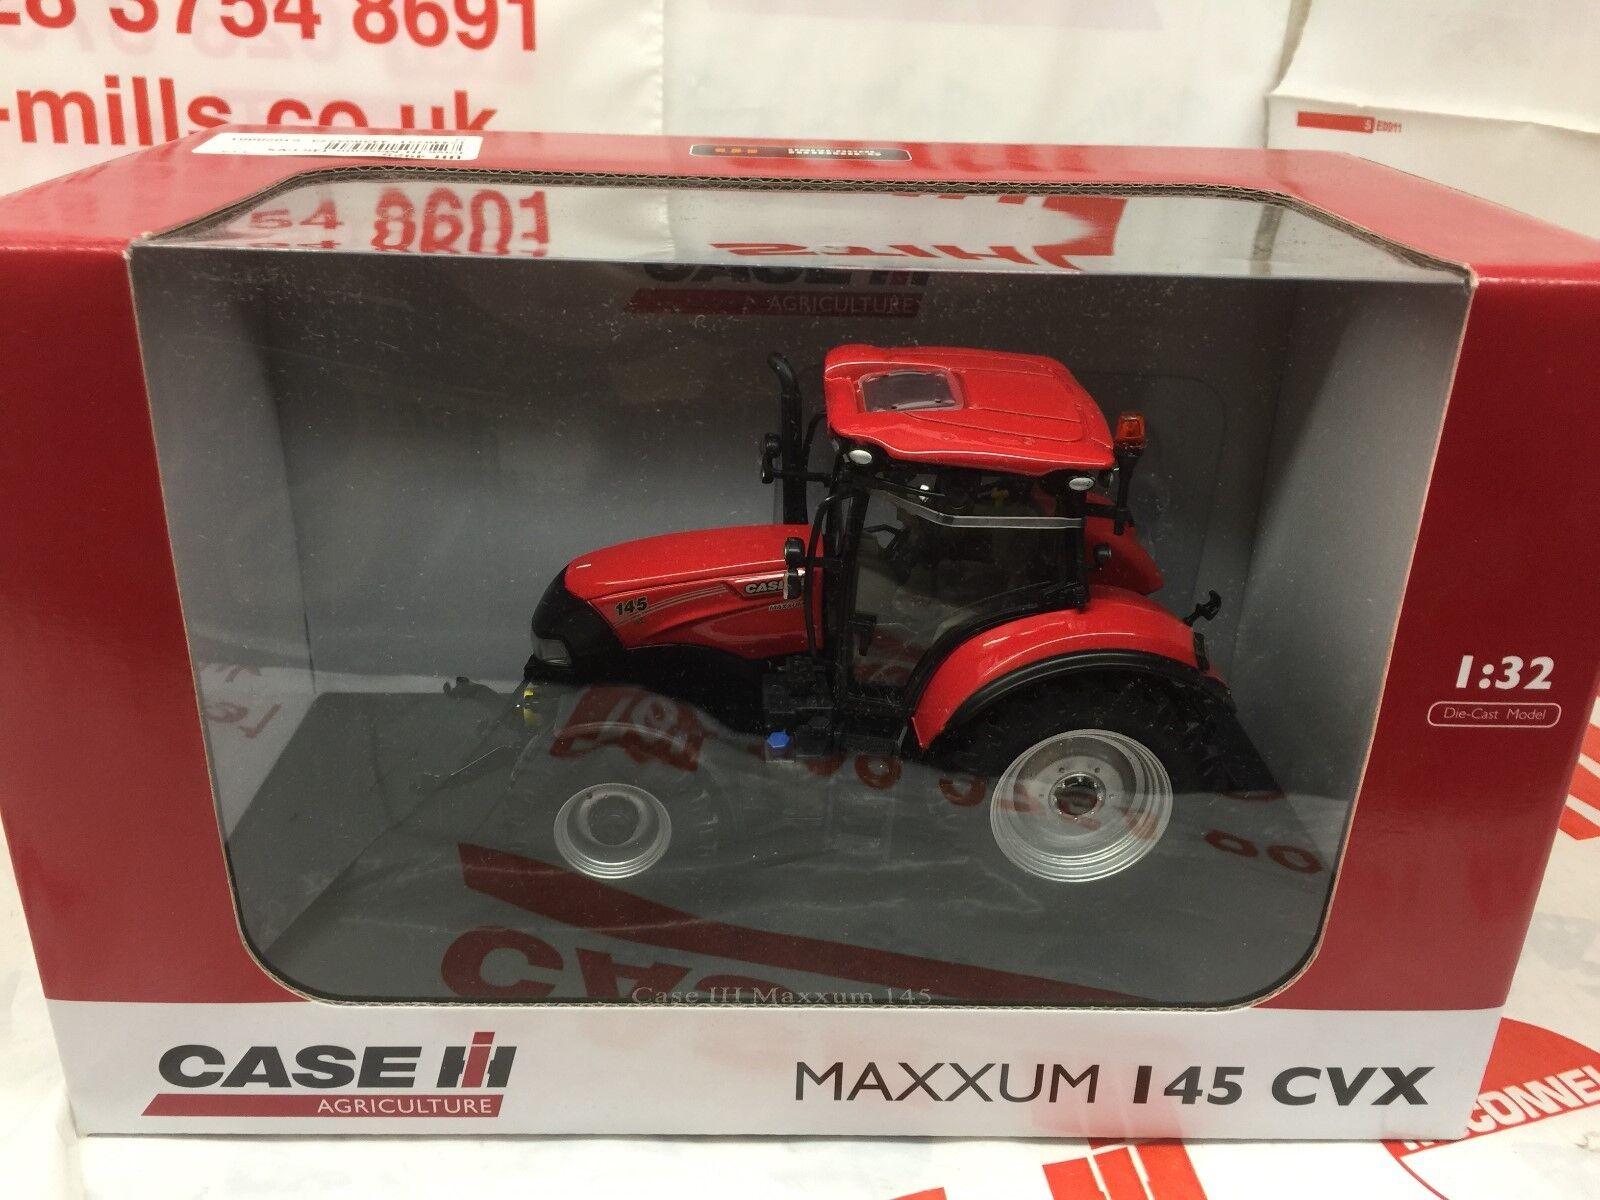 Universal Hobbies UH4925 CASE IH MAXXUM 145 CVX Tracteur 1 32 Replica Model Toy